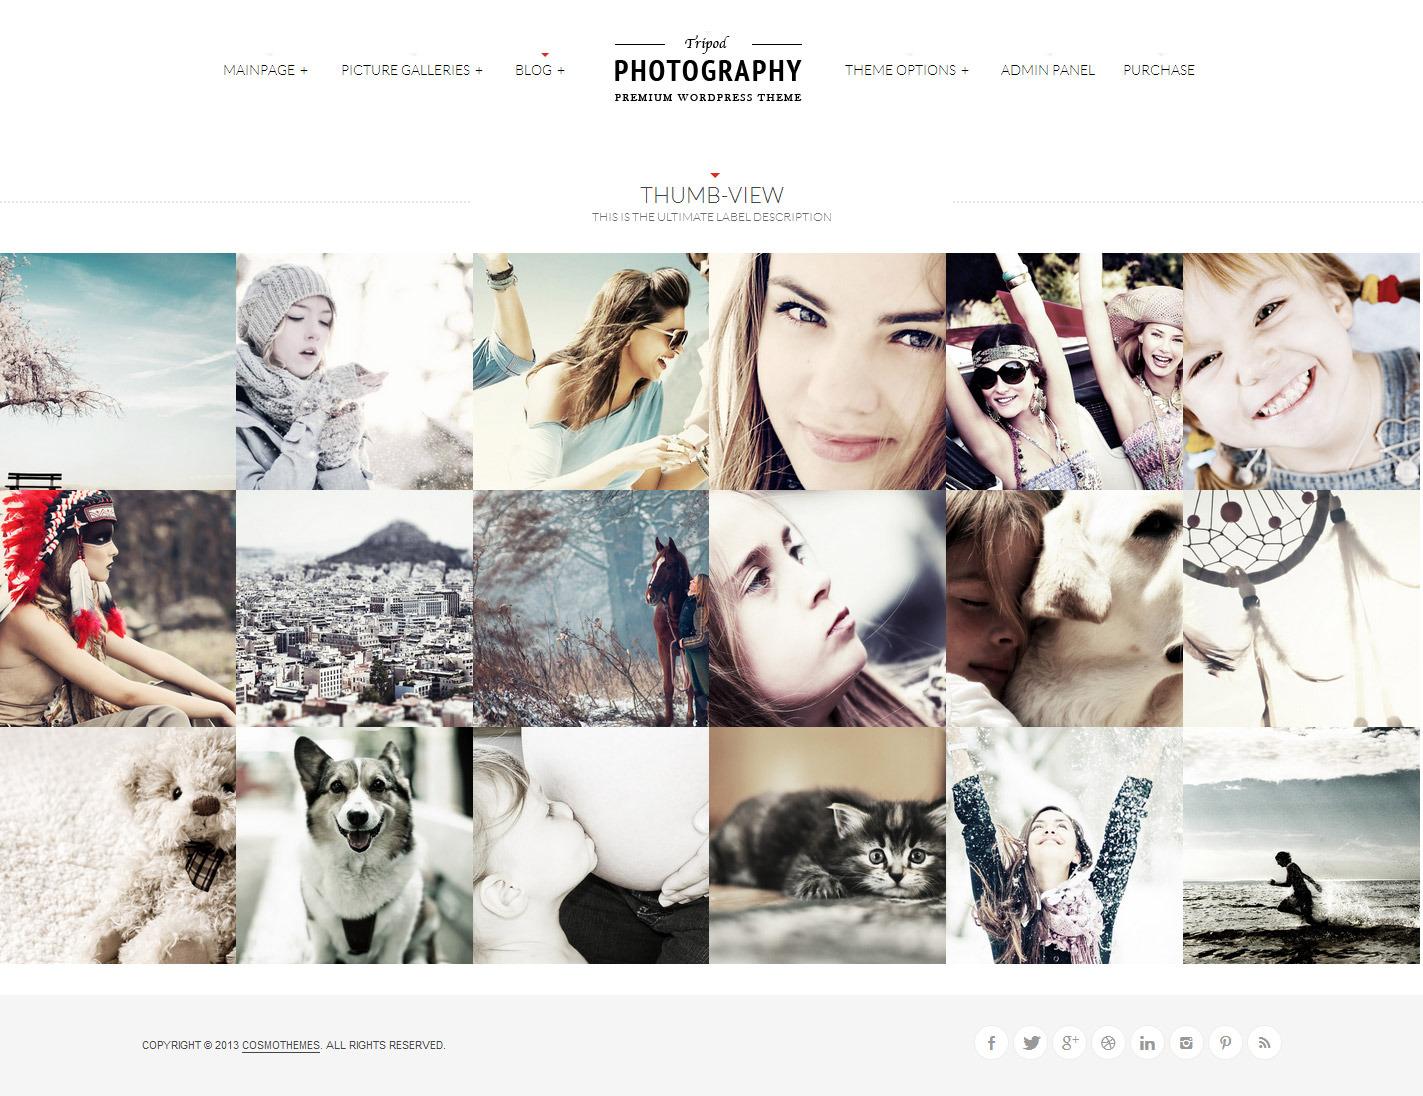 Type photography select 5 option input